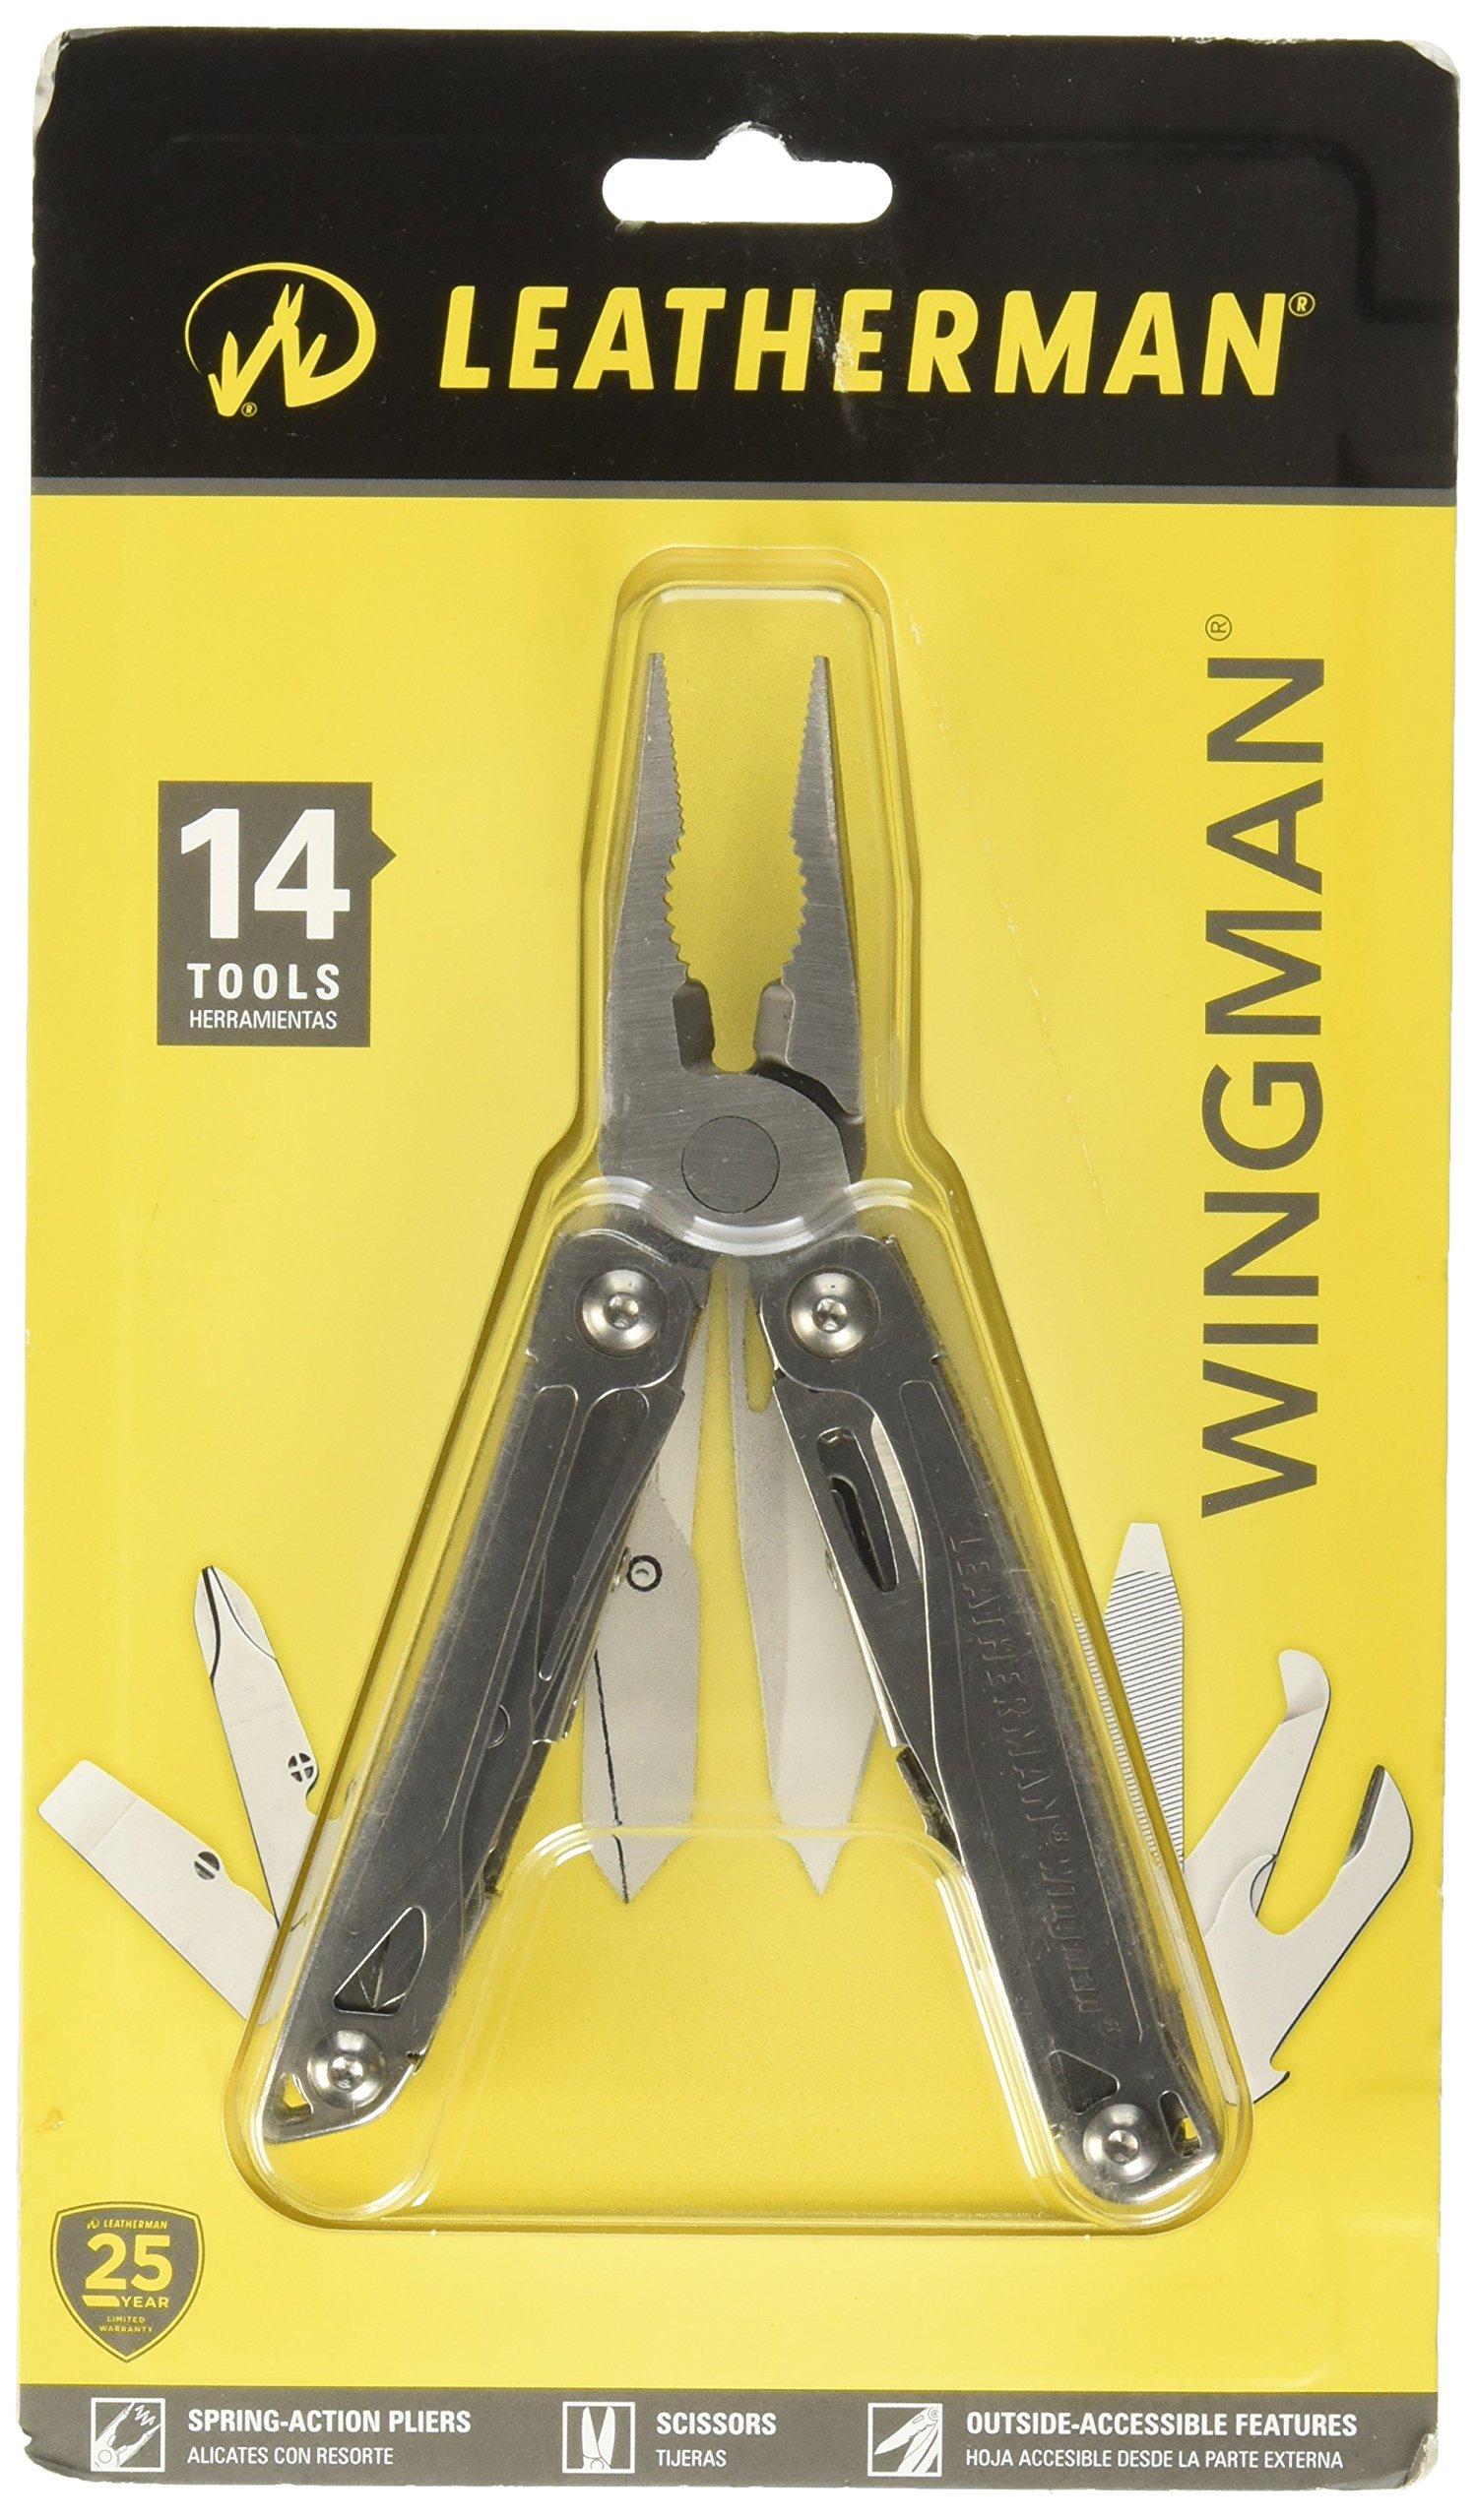 Leatherman (831425) Wingman Multi-Tool, Silver, 14 Piece Set product image